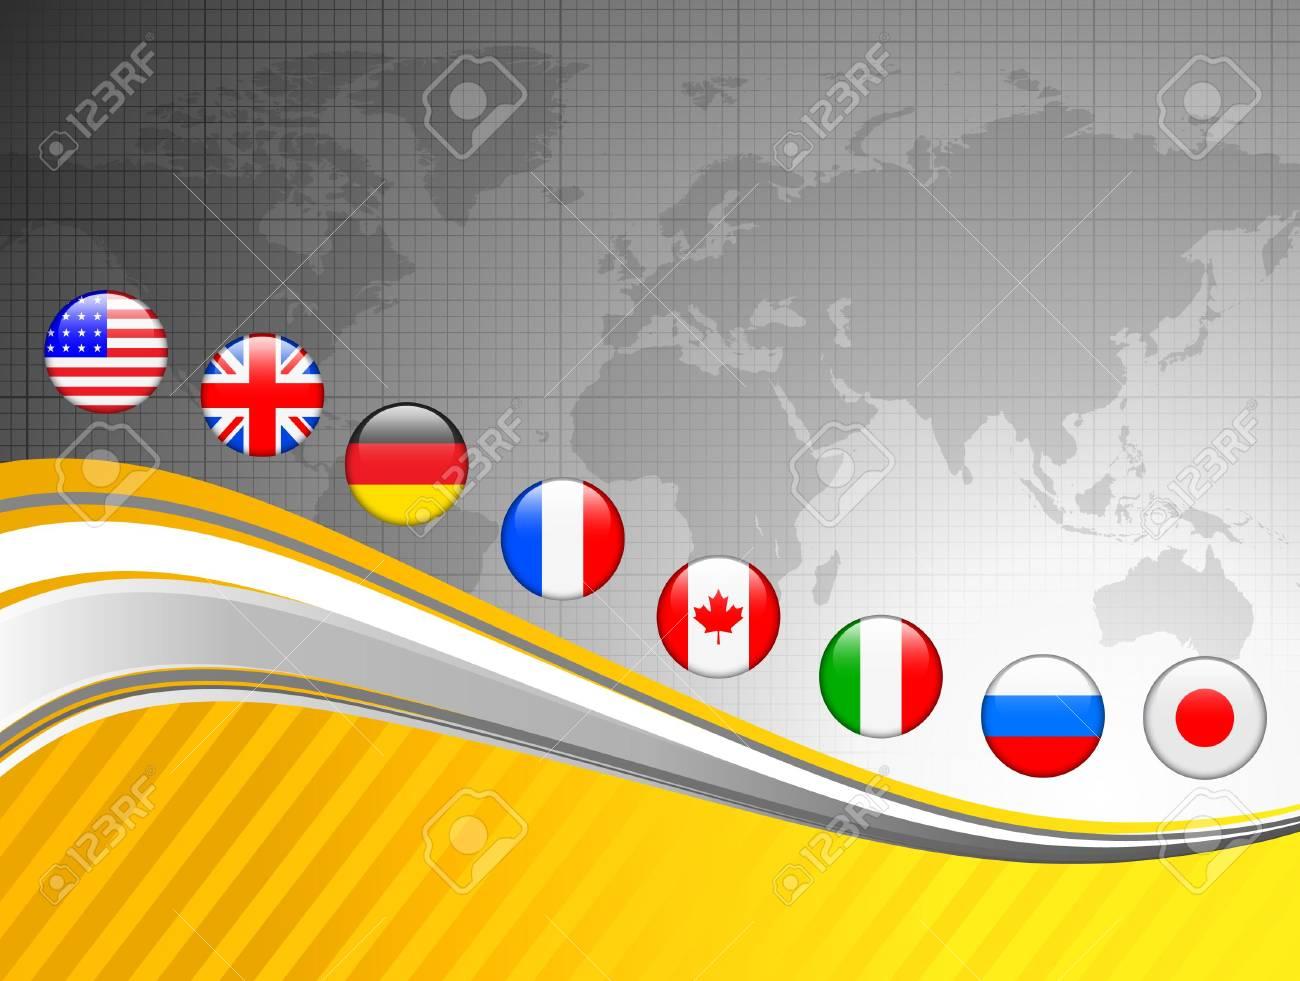 World Map with Internet Flag Buttons BackgroundOriginal Vector Illustration Stock Illustration - 6441398